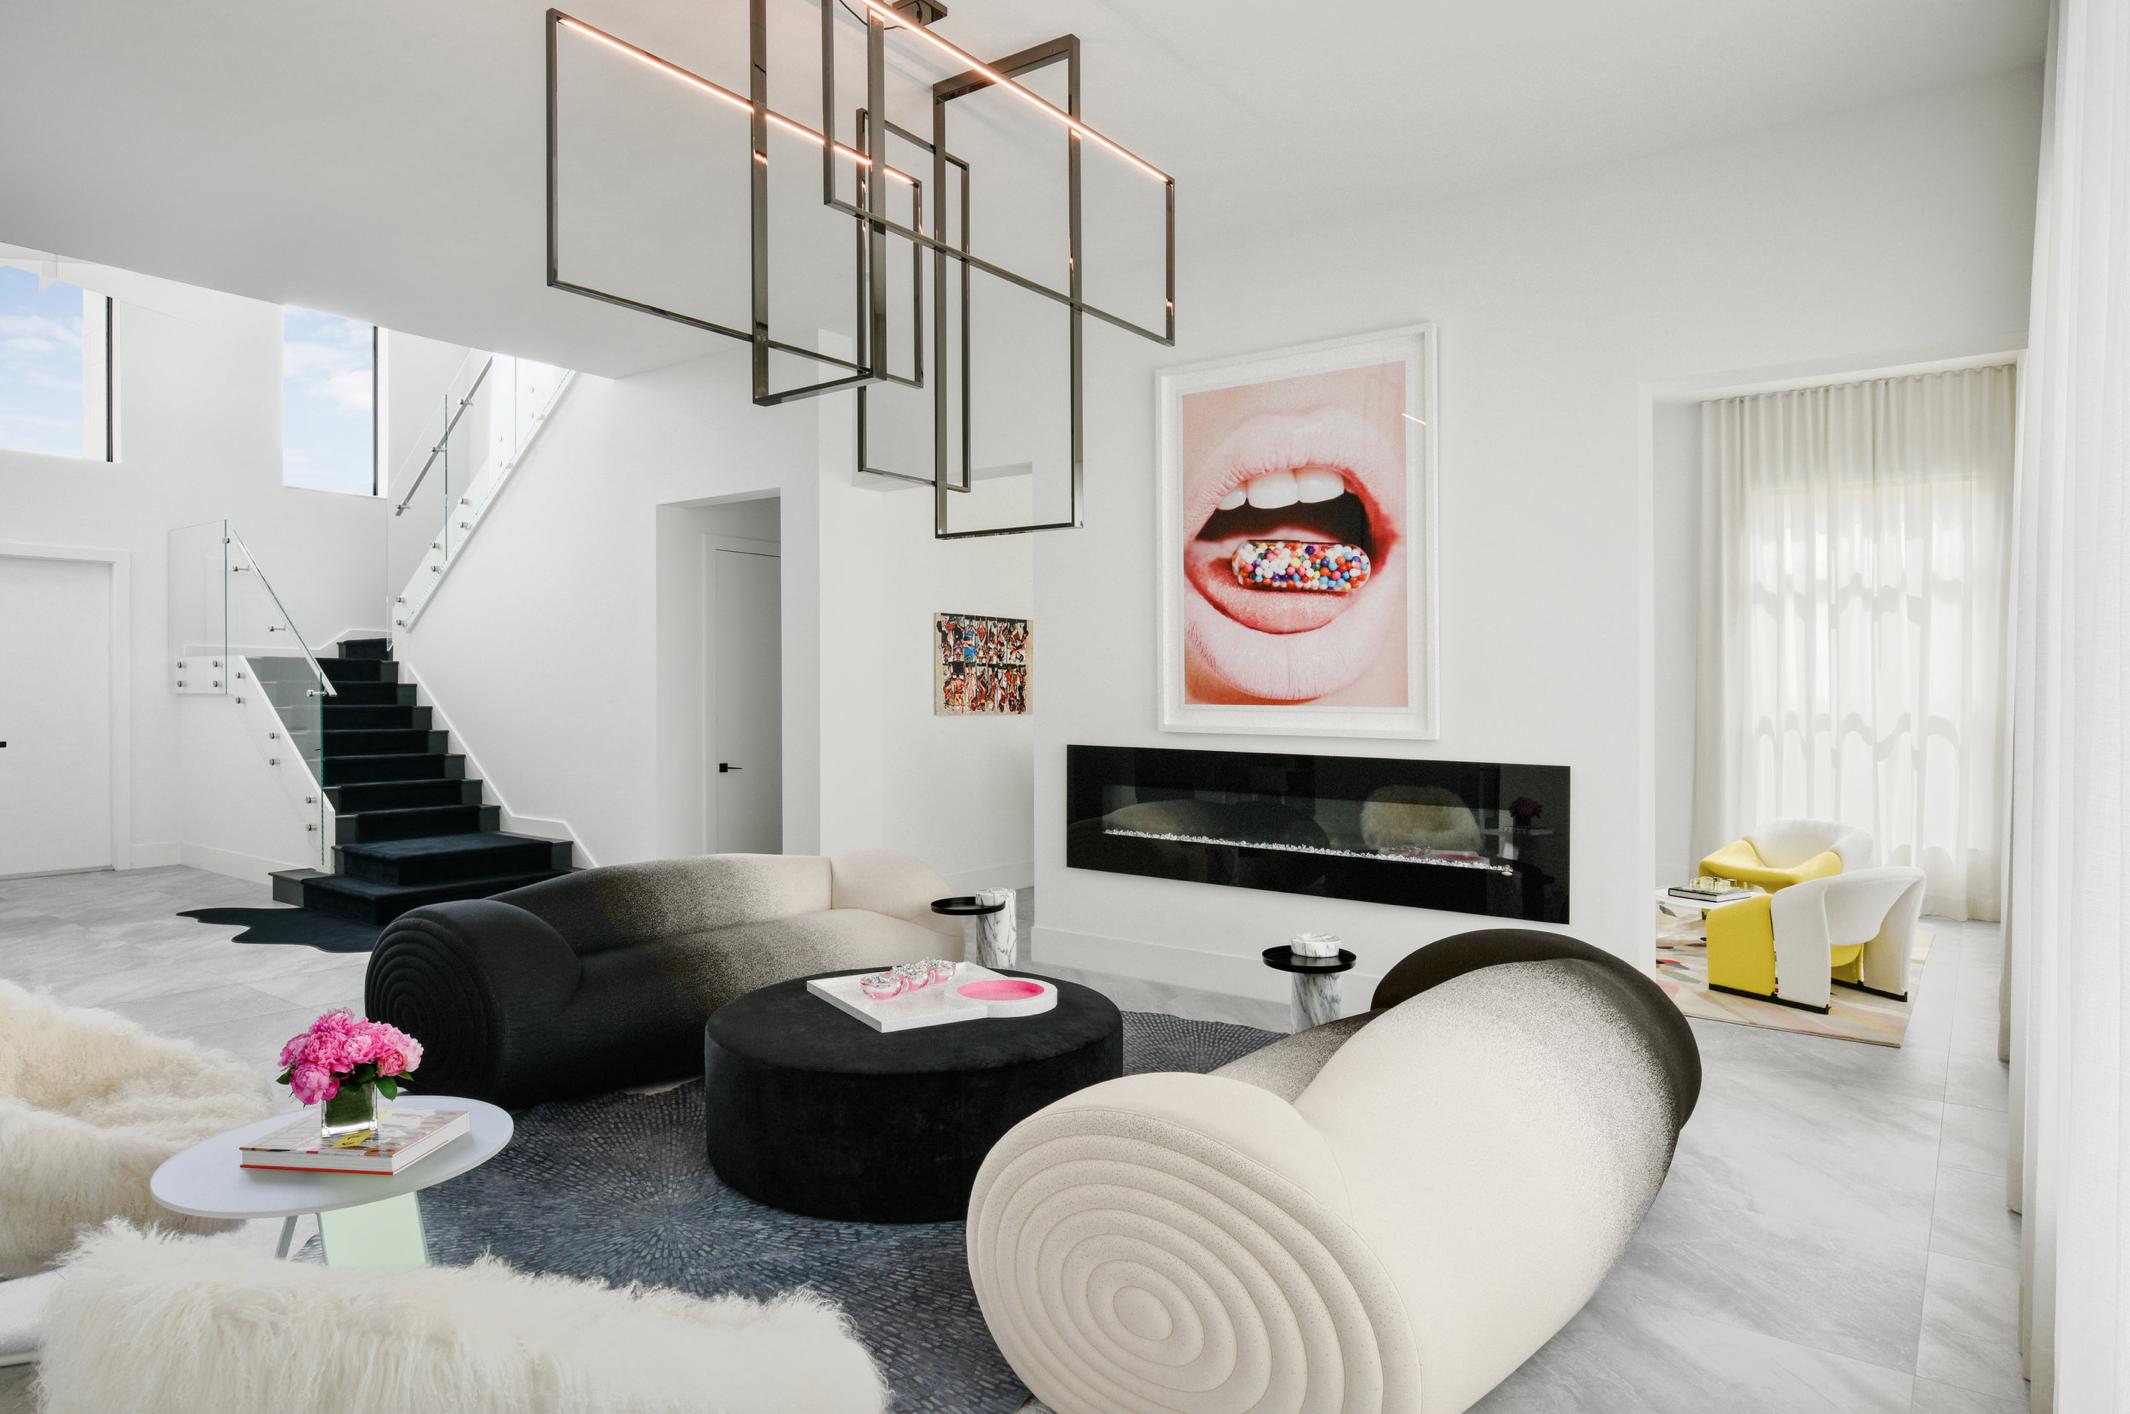 Living Room Designed By Melanie Morris Interiors Venicem Moroso Thesefinewalls Popofpink Shimmersidetable Interior Living Room Designs Formal Living Rooms